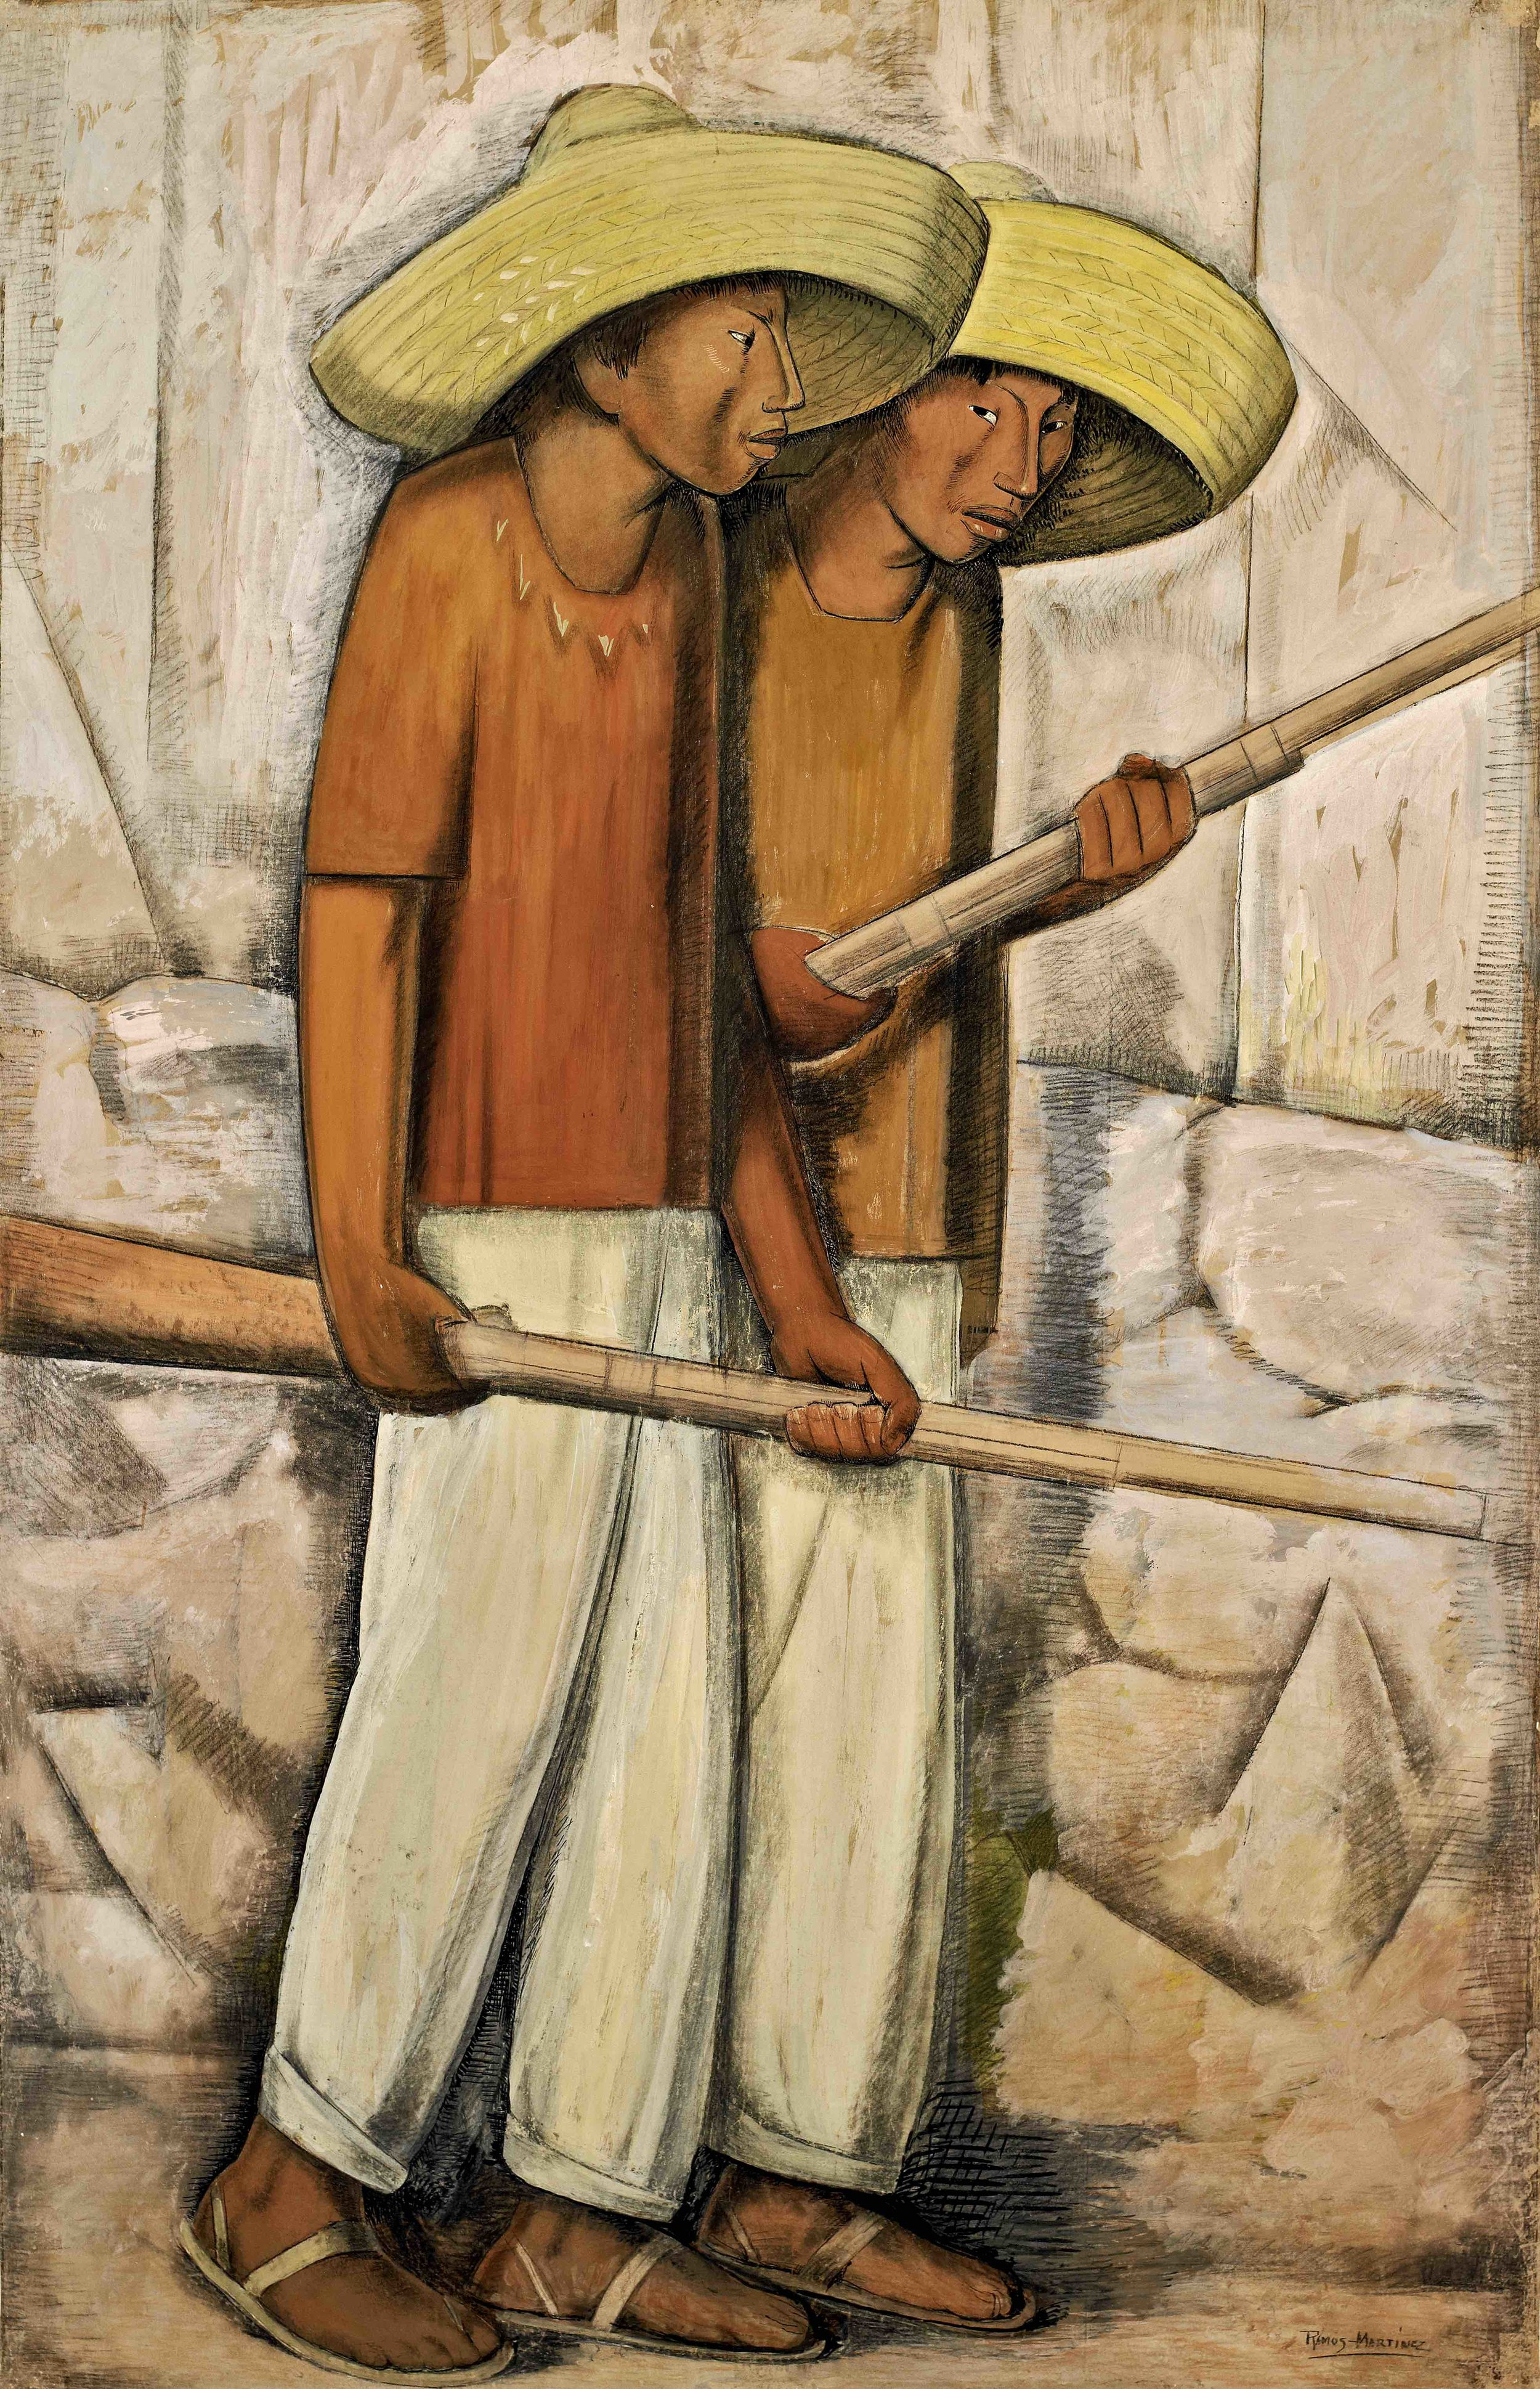 Rurales / Men of the Countryside  ca. 1935 tempera and Conté crayon on paper mounted on board / temple y crayon Conté sobre papel sobre tabla 69.5 x 43.4 inches; 176.5 x 110.2 centímetros